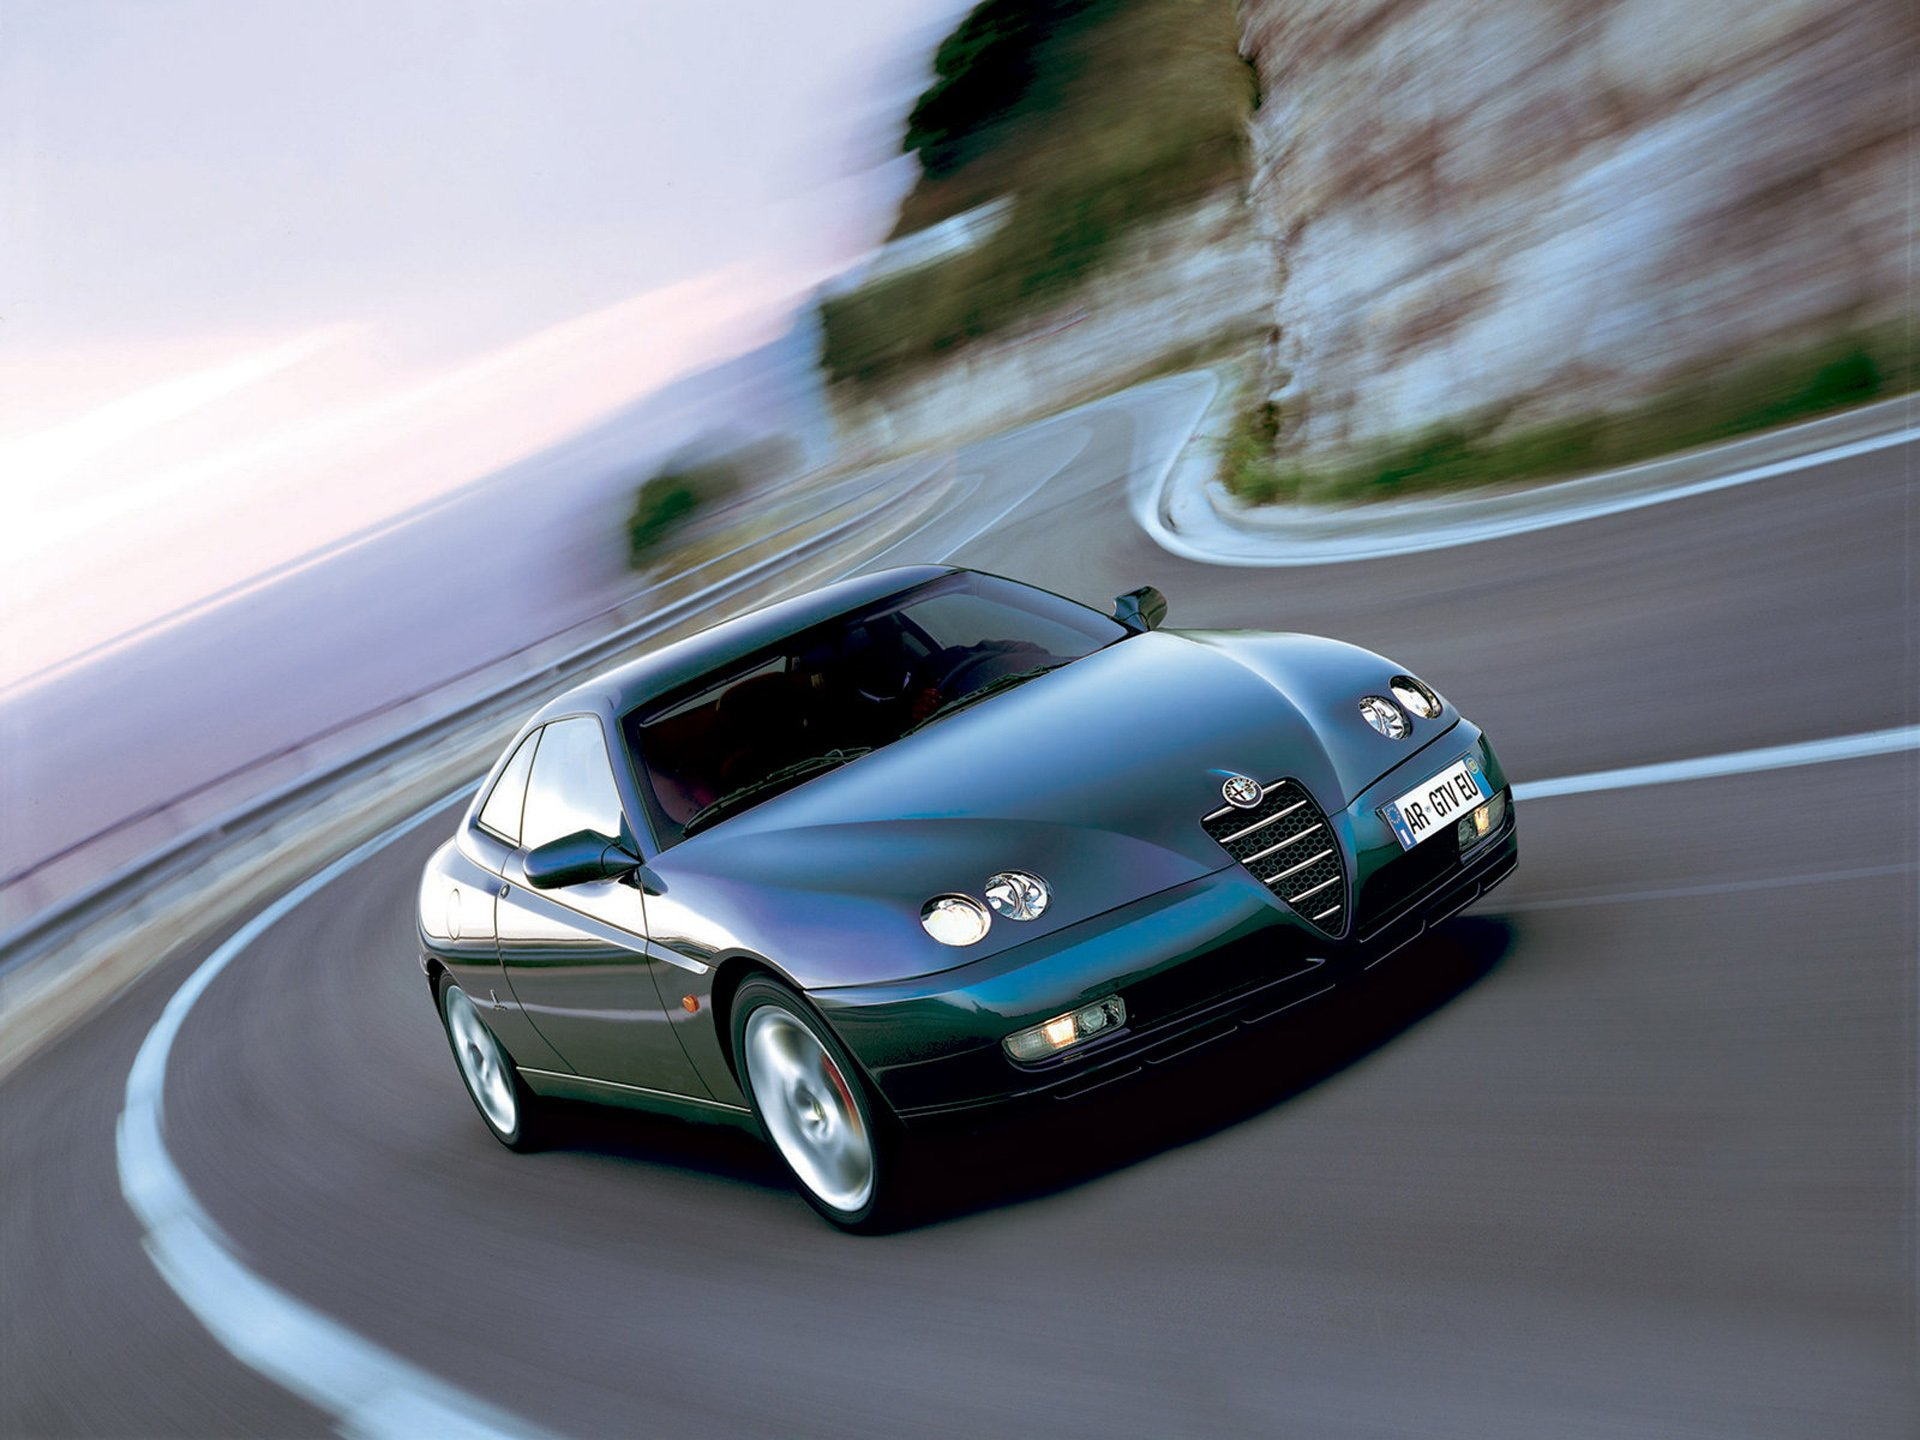 Alfa Romeo Gtv Hd Wallpaper Background Image 1920x1440 Id 468601 Wallpaper Abyss